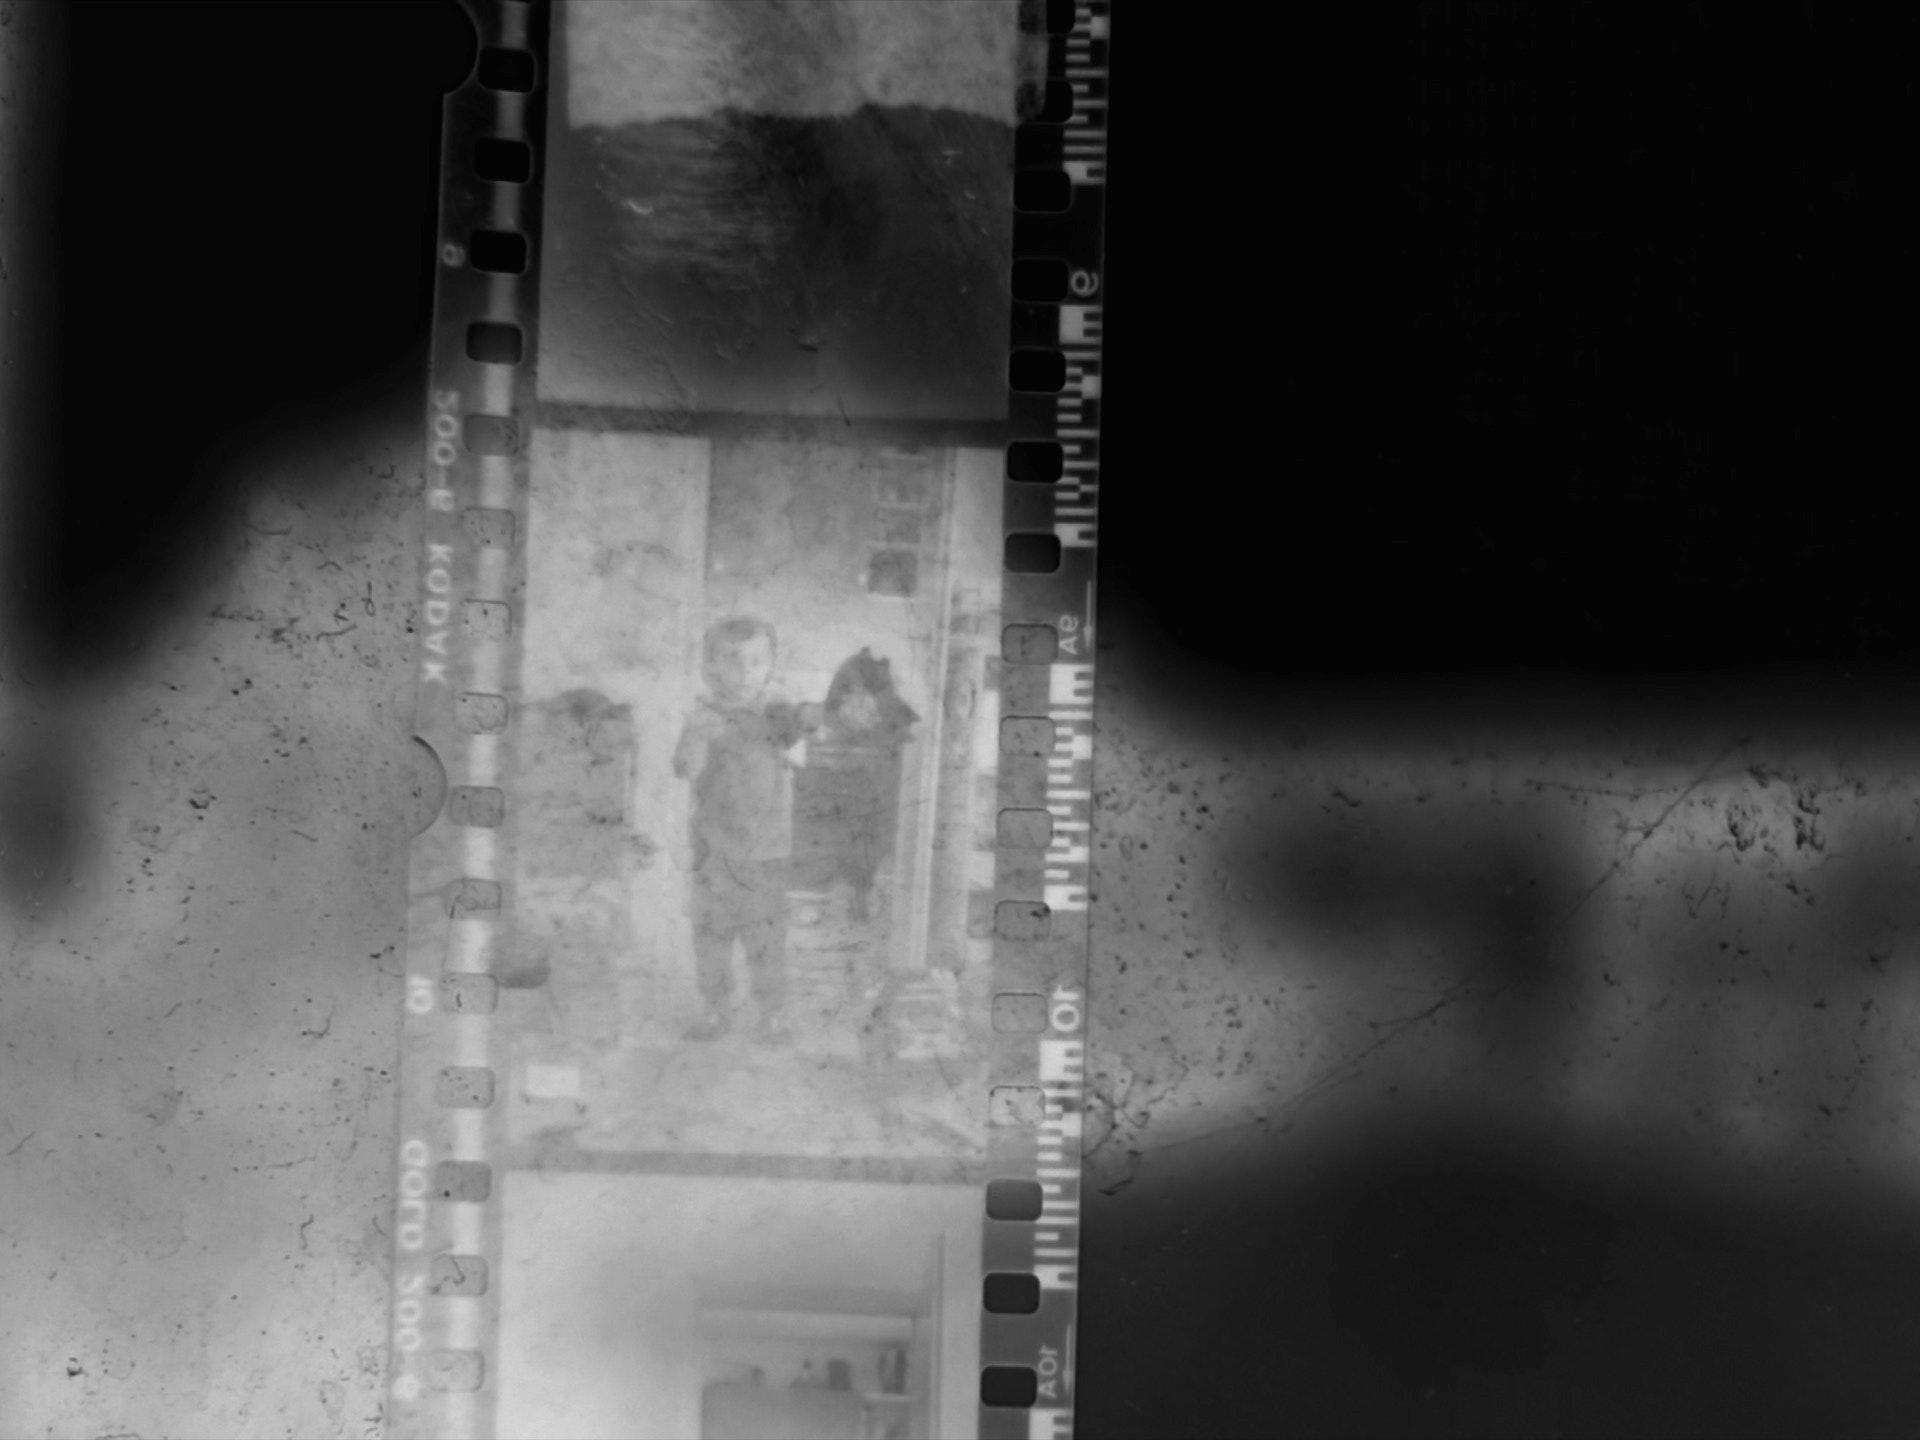 abstract film negative of young filmmaker Maciek Kaliski